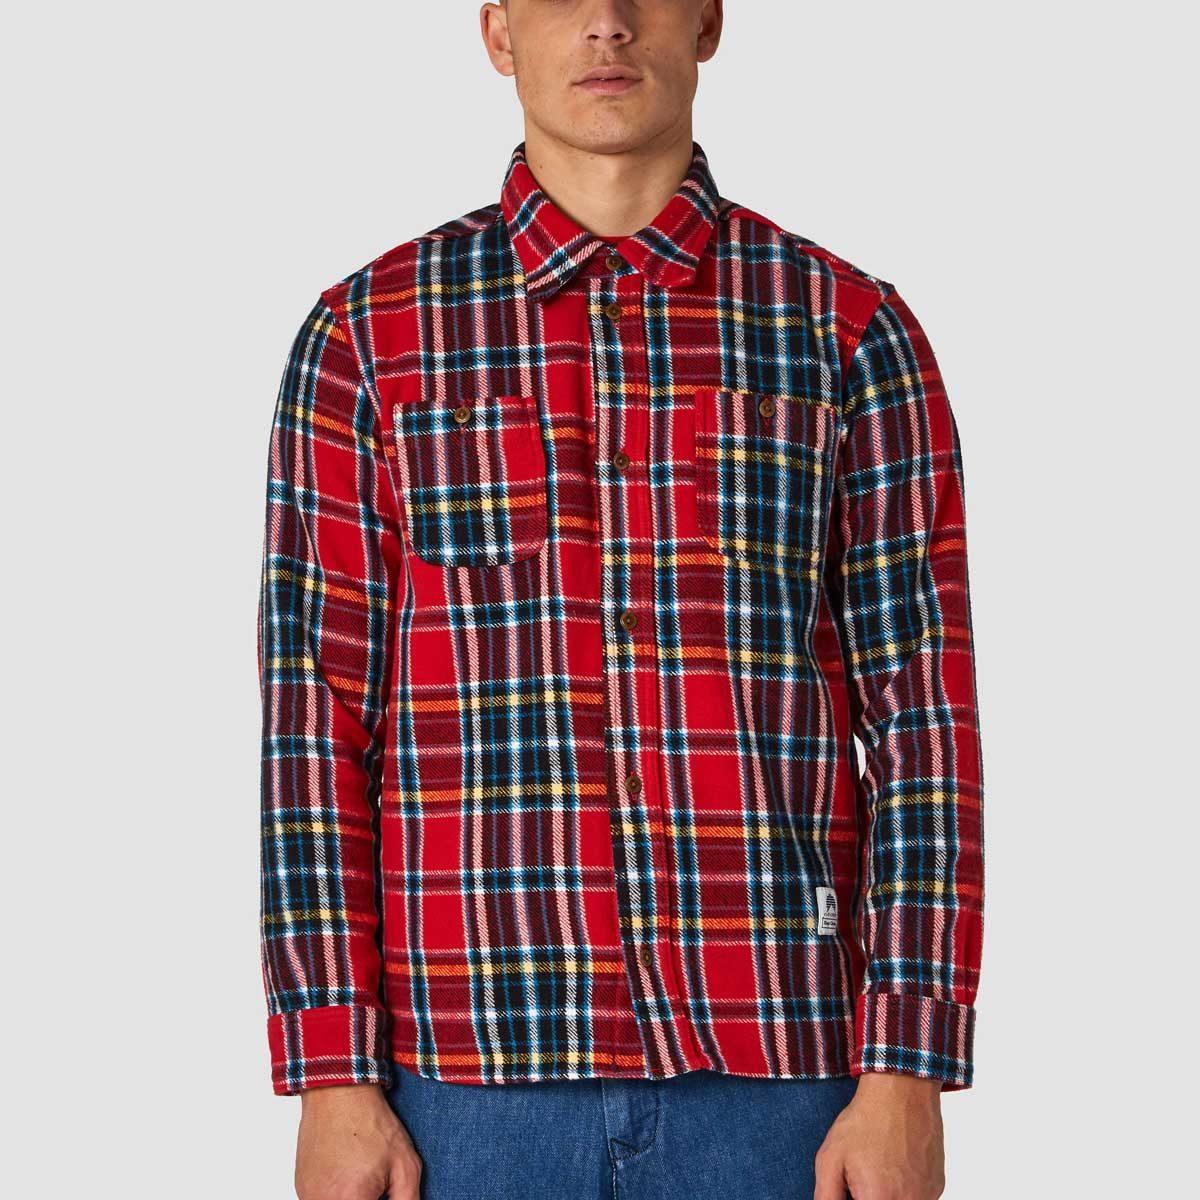 juntoku röd flannelskjorta herr rutig ekologisk bomull